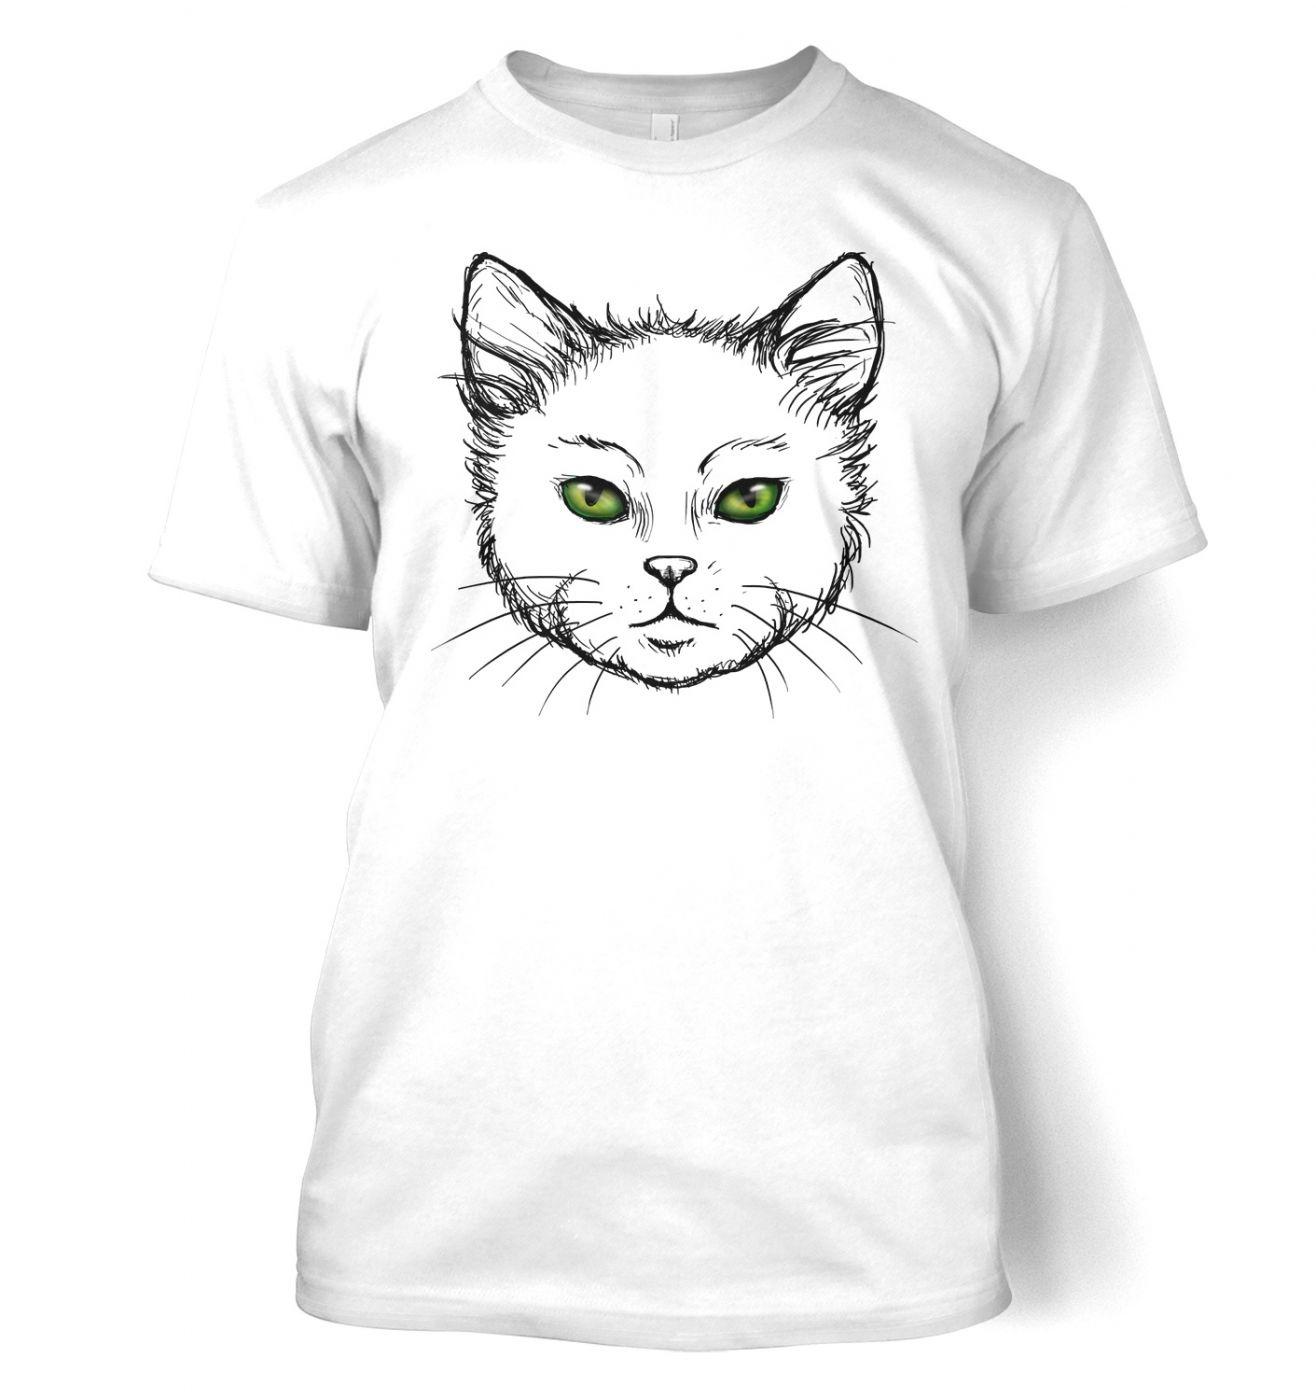 Eyes Of The Cat t-shirt (white) - Cute cat tshirt